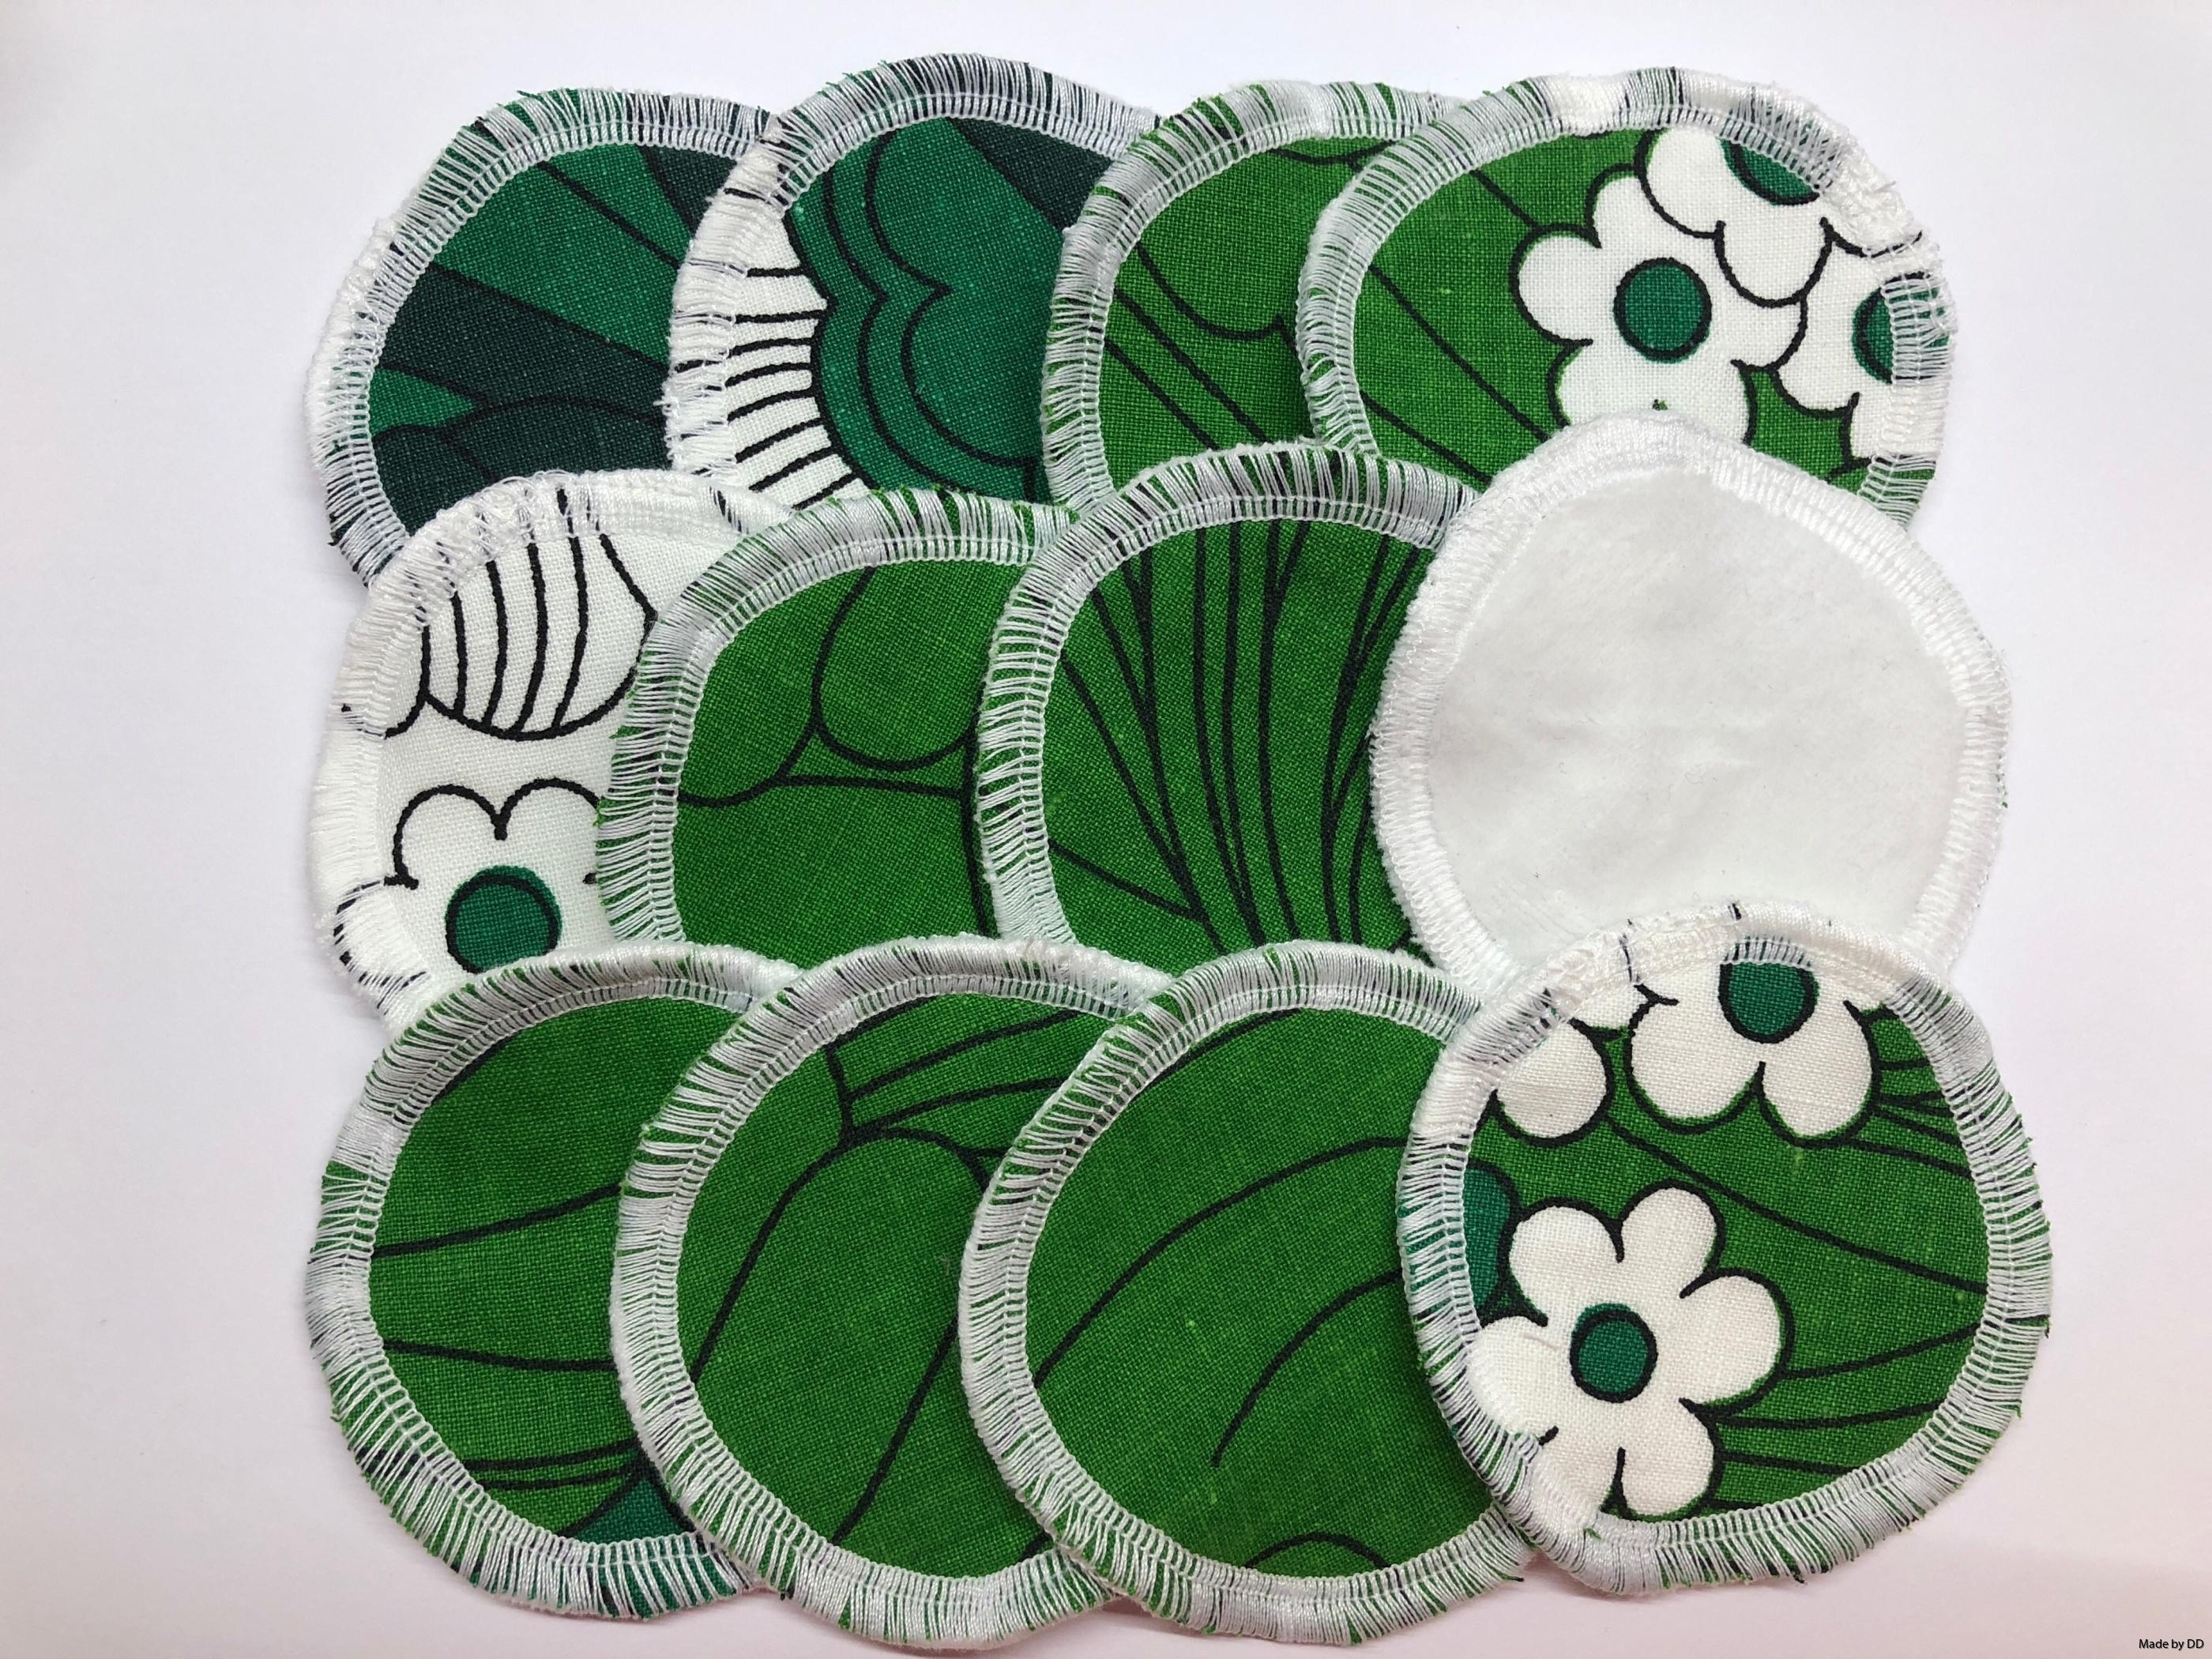 Rengöringspads rengöringsrondeller bomullsrondeller återbruk sjuttiontalstyg bomullsvelour ekologiskt GOTS made by dd grön